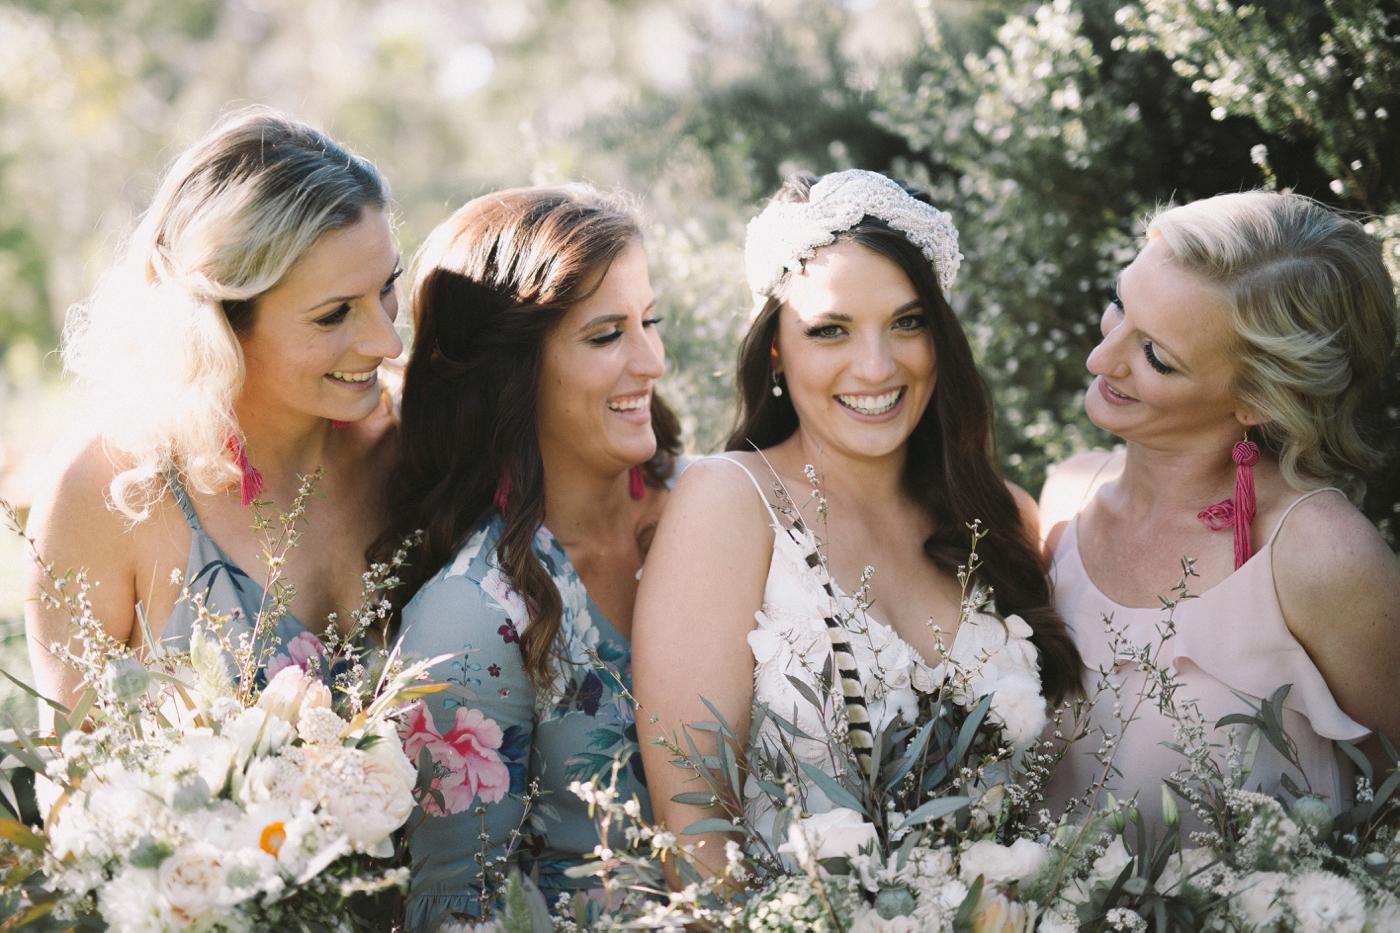 Maddy & Wes - K1 by Geoff Hardy Wedding - Adelaide Wedding Photographer - Natural wedding photography in Adelaide - Katherine Schultz_0041.jpg